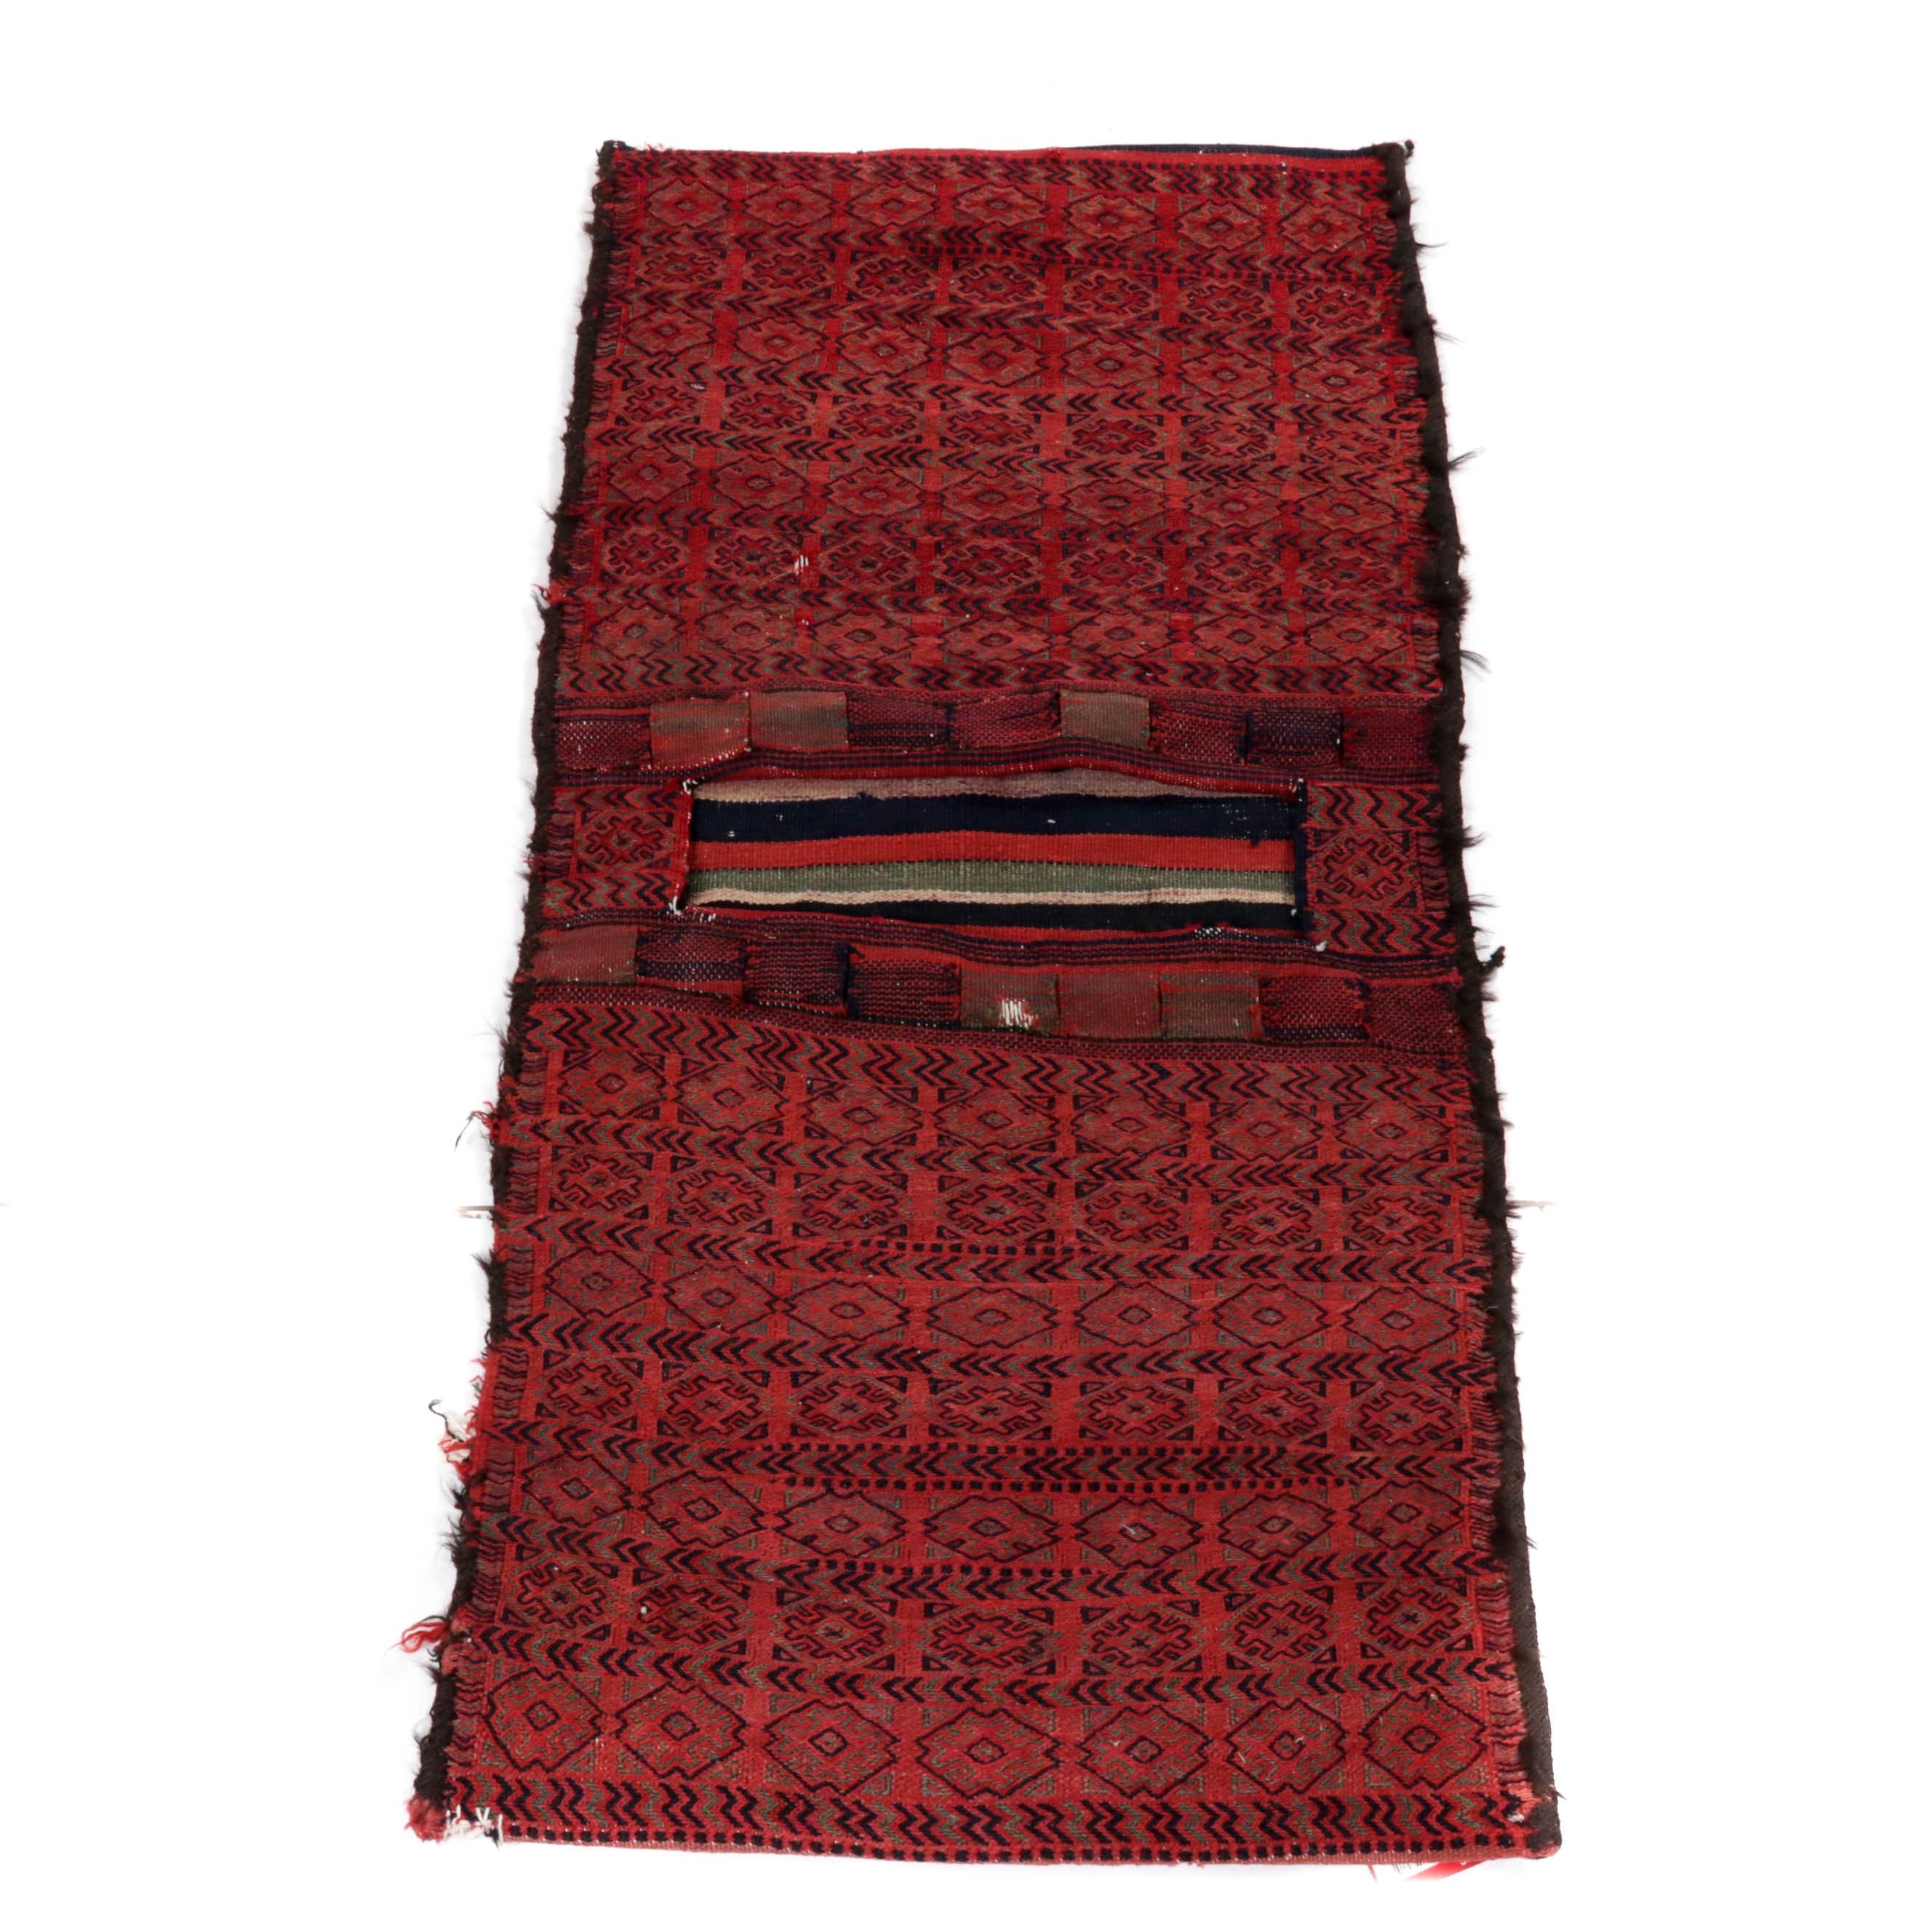 2.2' x 4.8' Hand-Knotted Persian Kurdish Saddle Bag, Circa 1920s